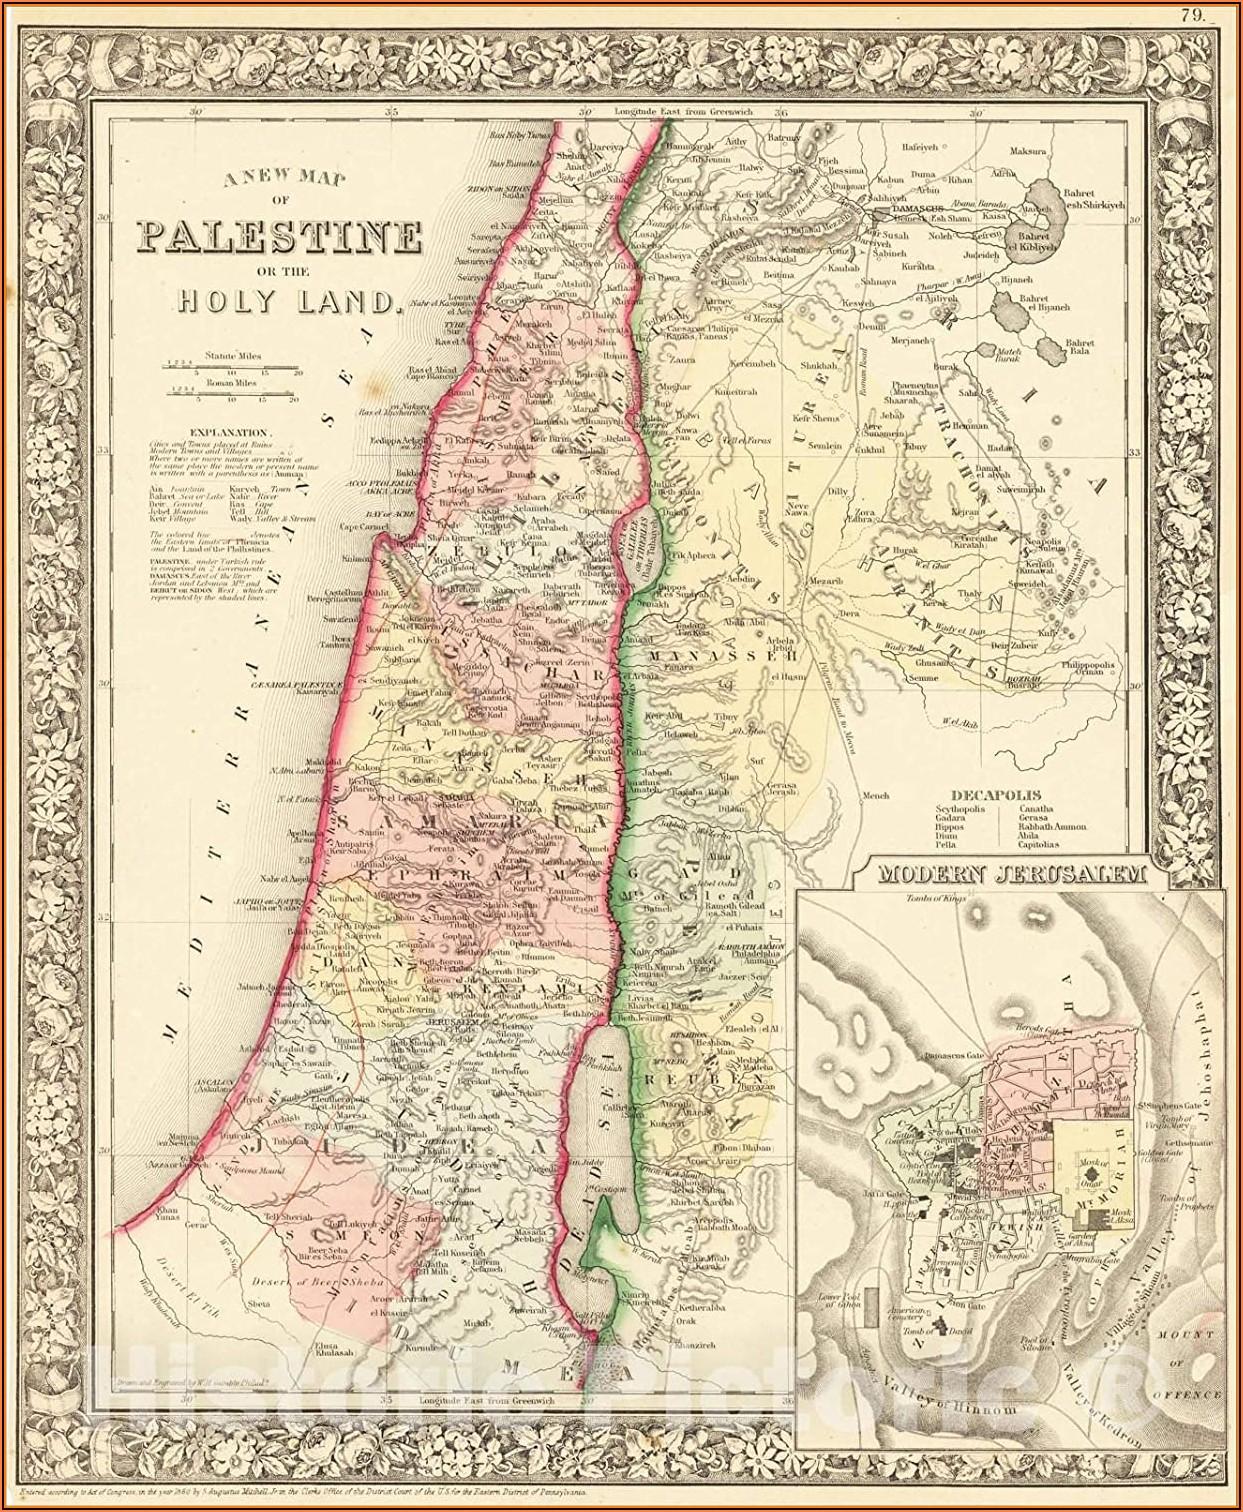 Historic Map Of Palestine